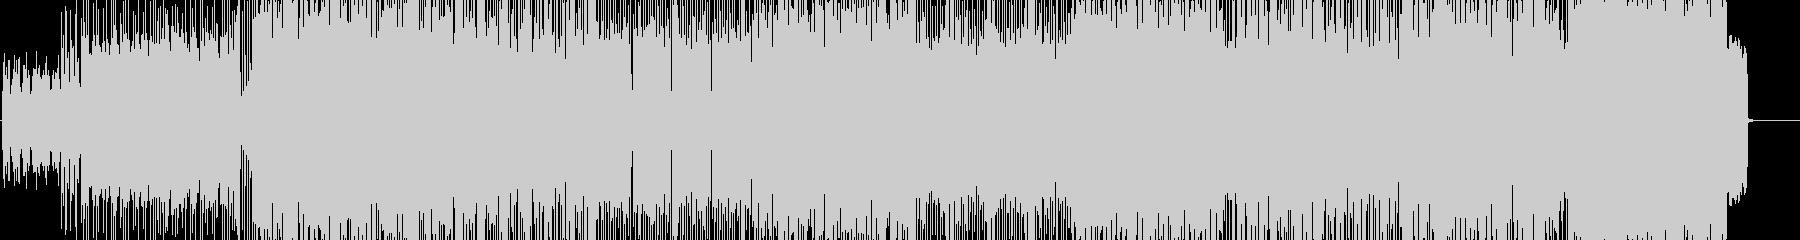 「HR/HM」「DARK」BGM37の未再生の波形